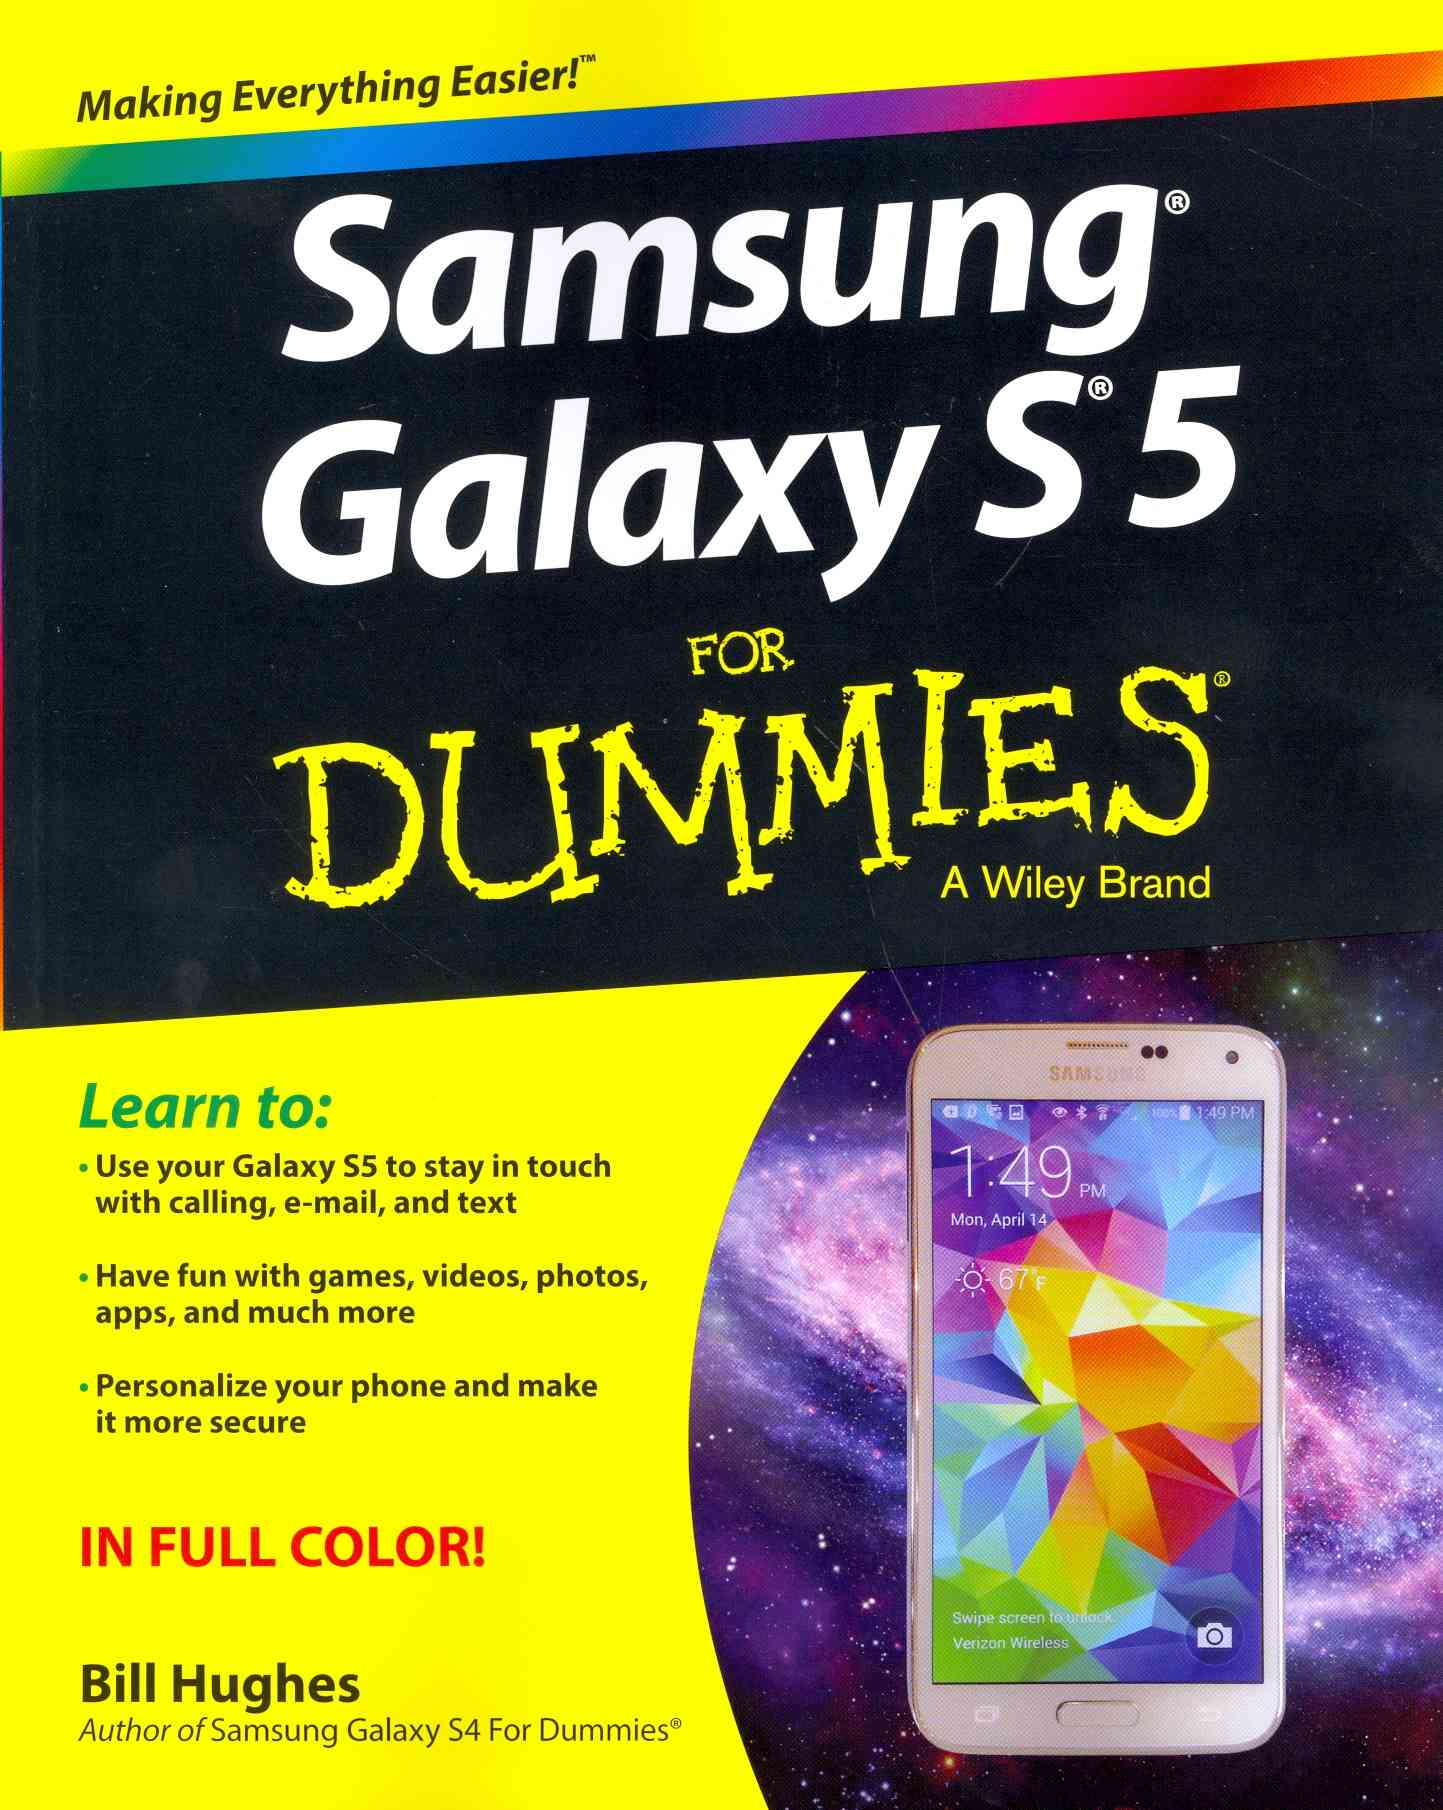 Samsung Galaxy S5 for Dummies By Hughes, Bill